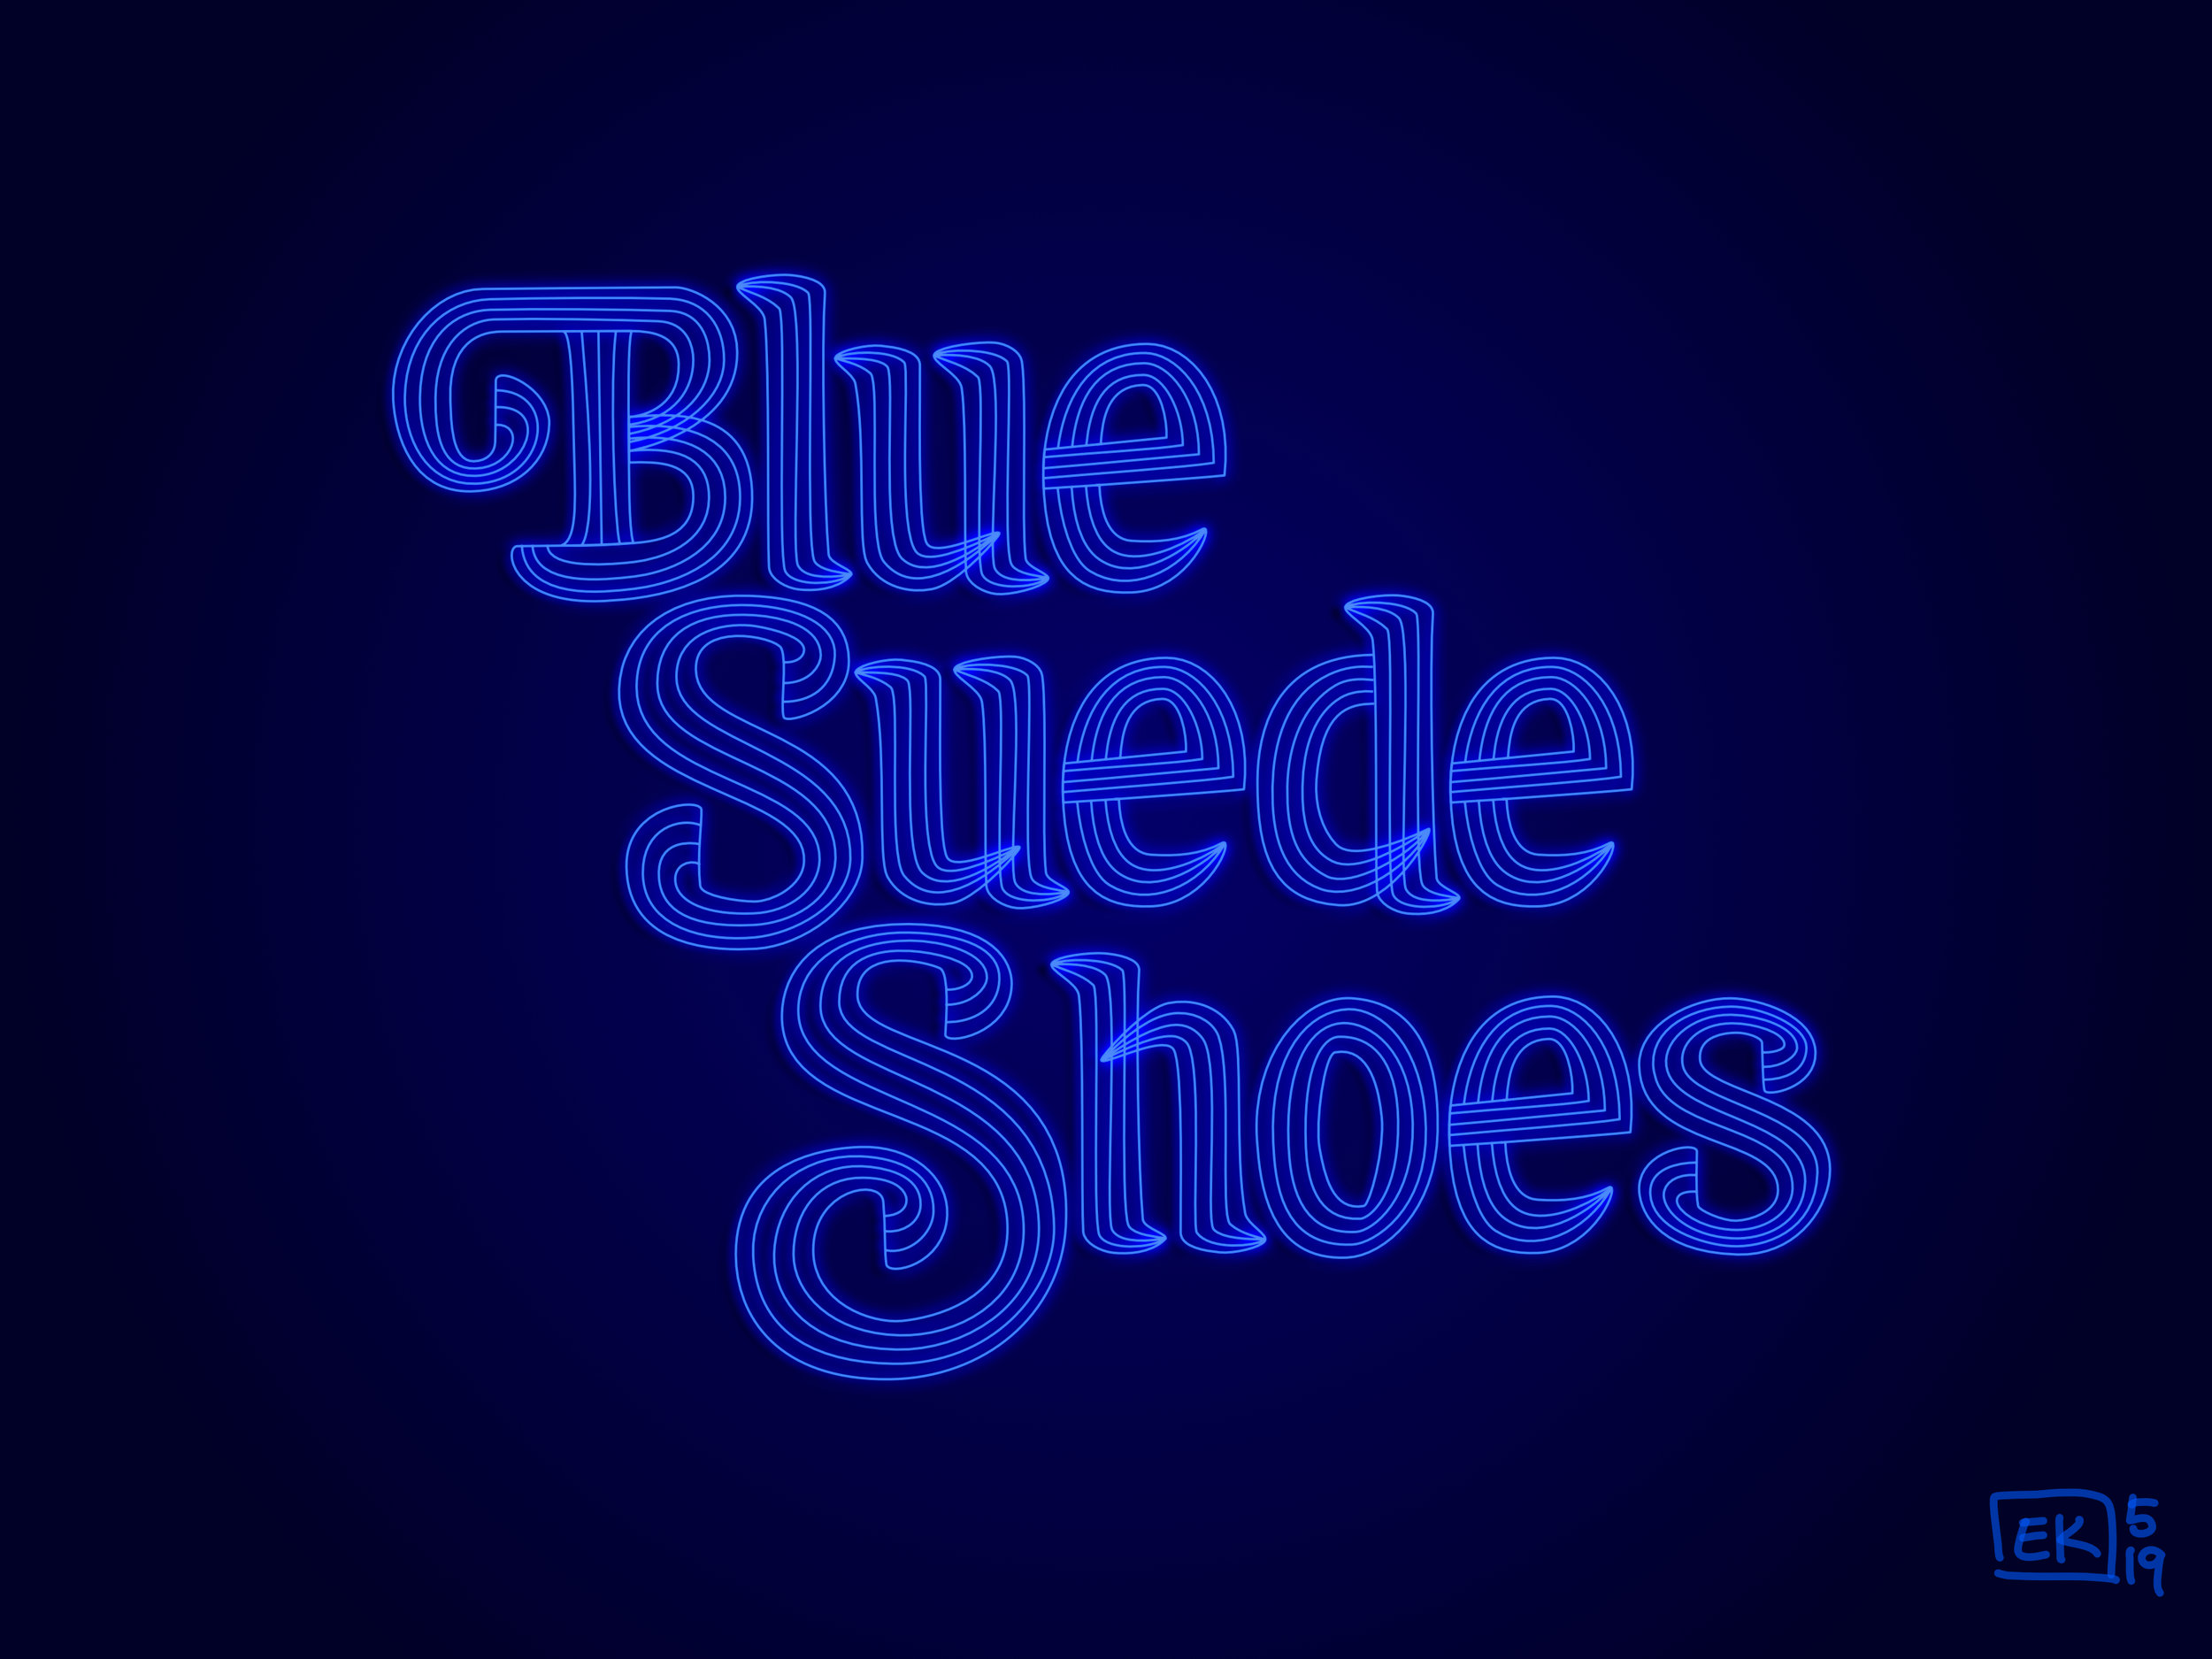 blue suede shoes vector - color.jpg